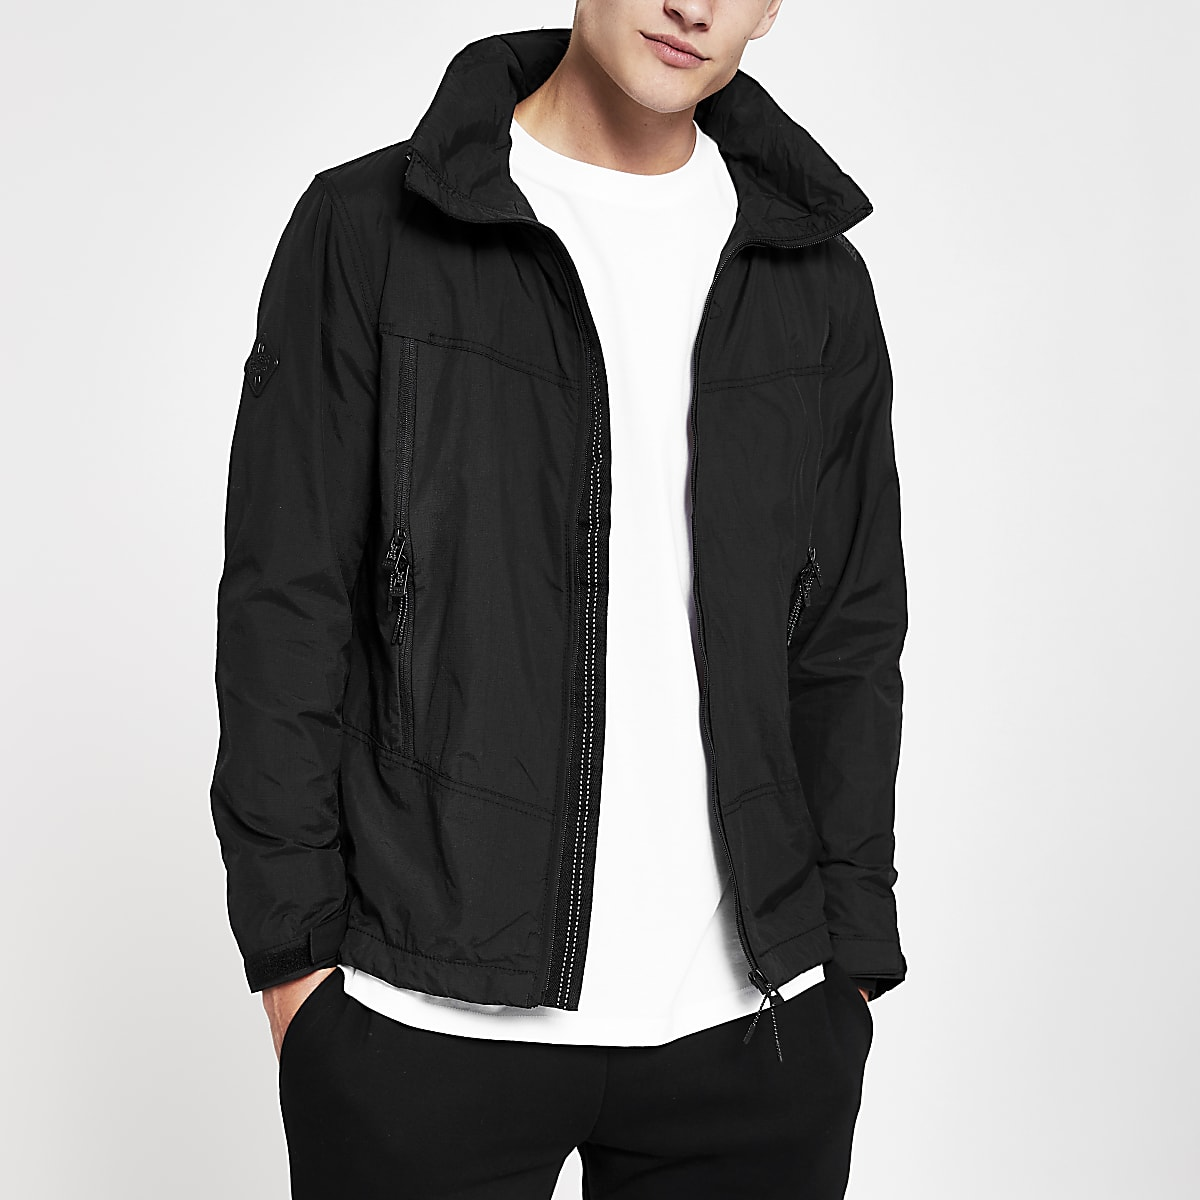 Superdry black lightweight jacket